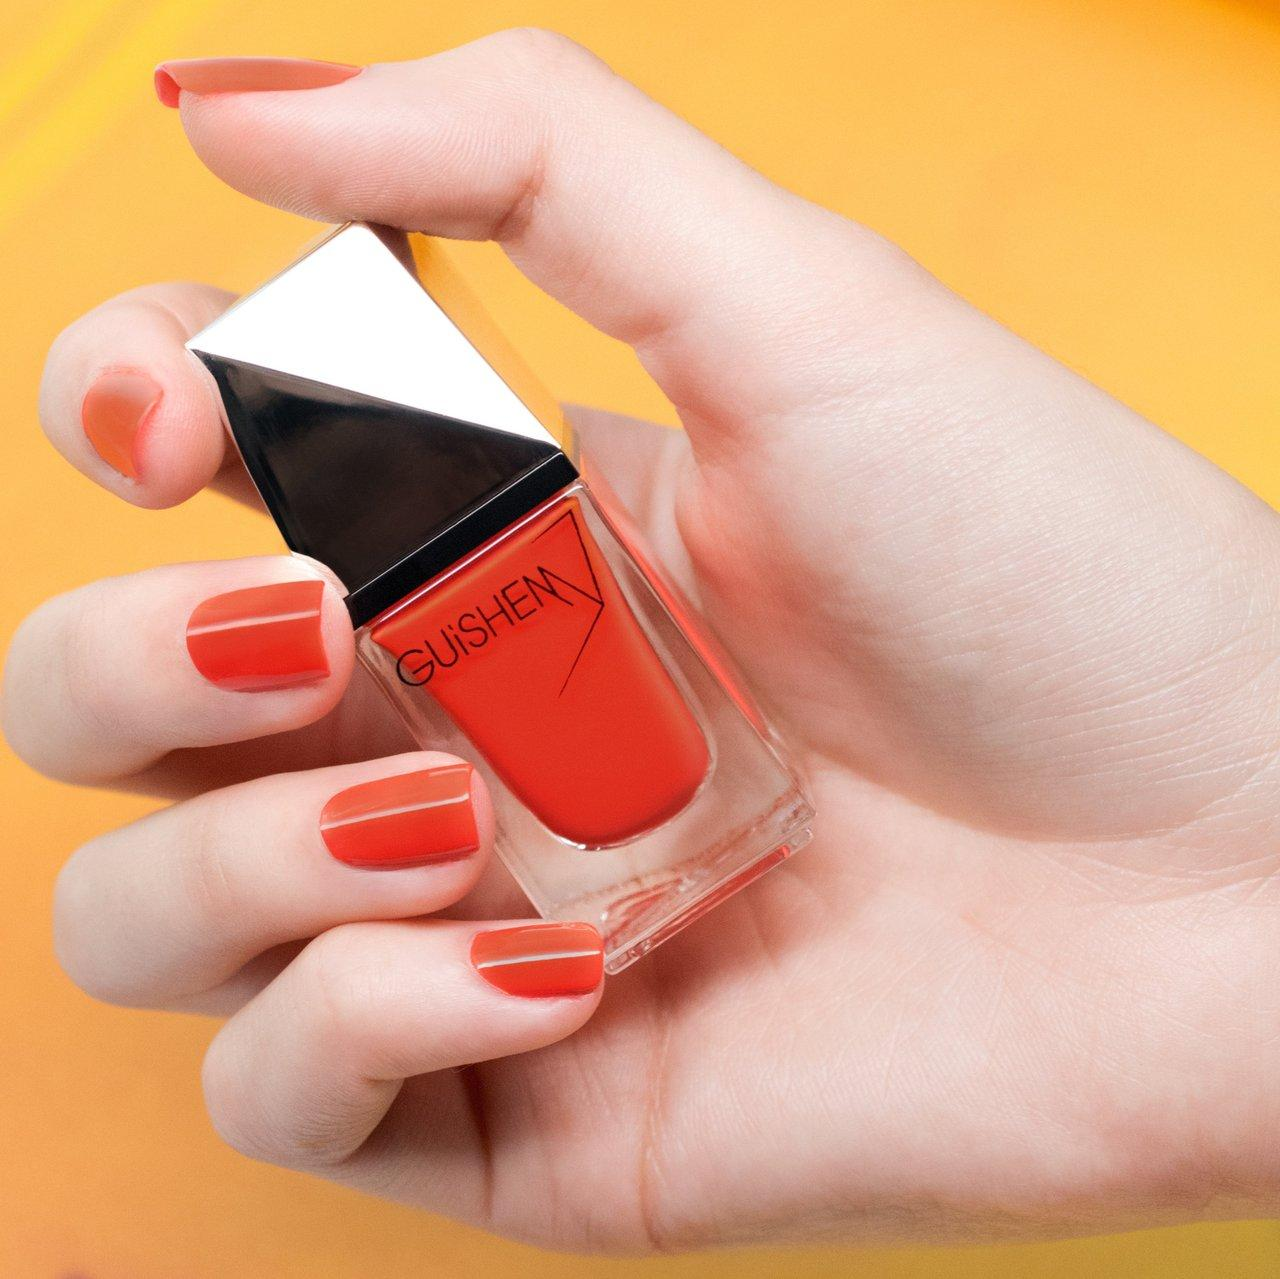 GUiSHEM Premium Nail Lacquer Crème Bright Redish Orange, Tangerine - 240